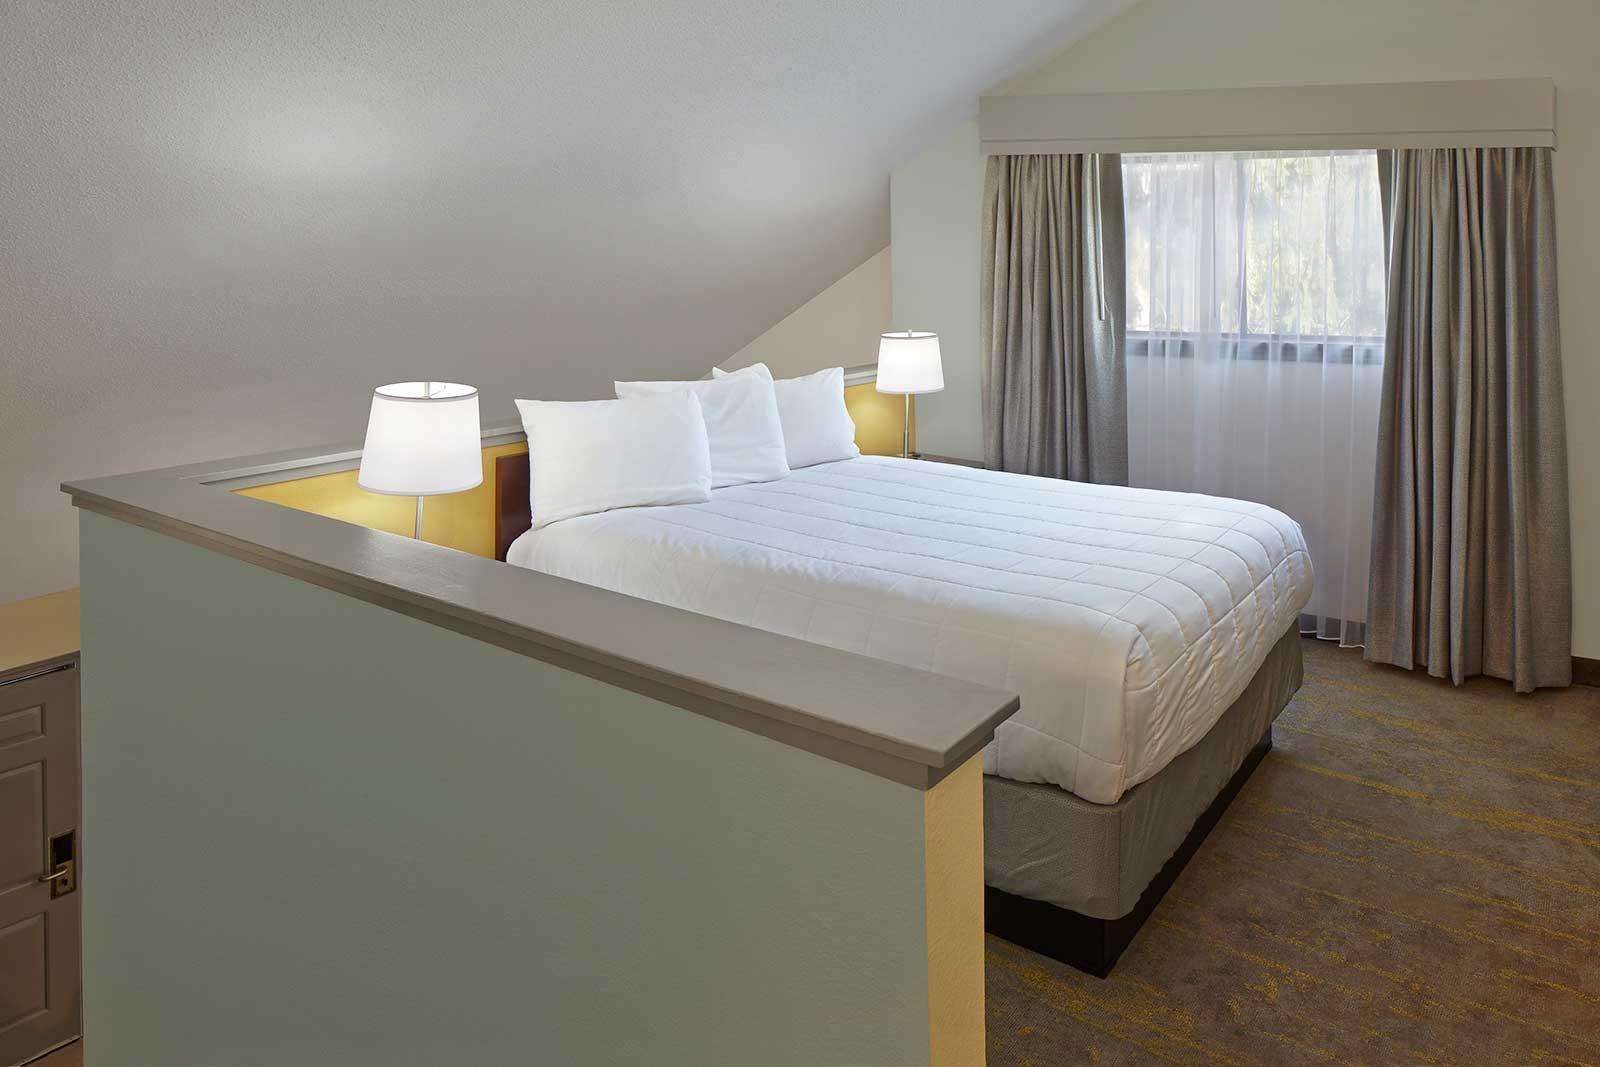 Two Bedroom Loft New Haven Village Suites